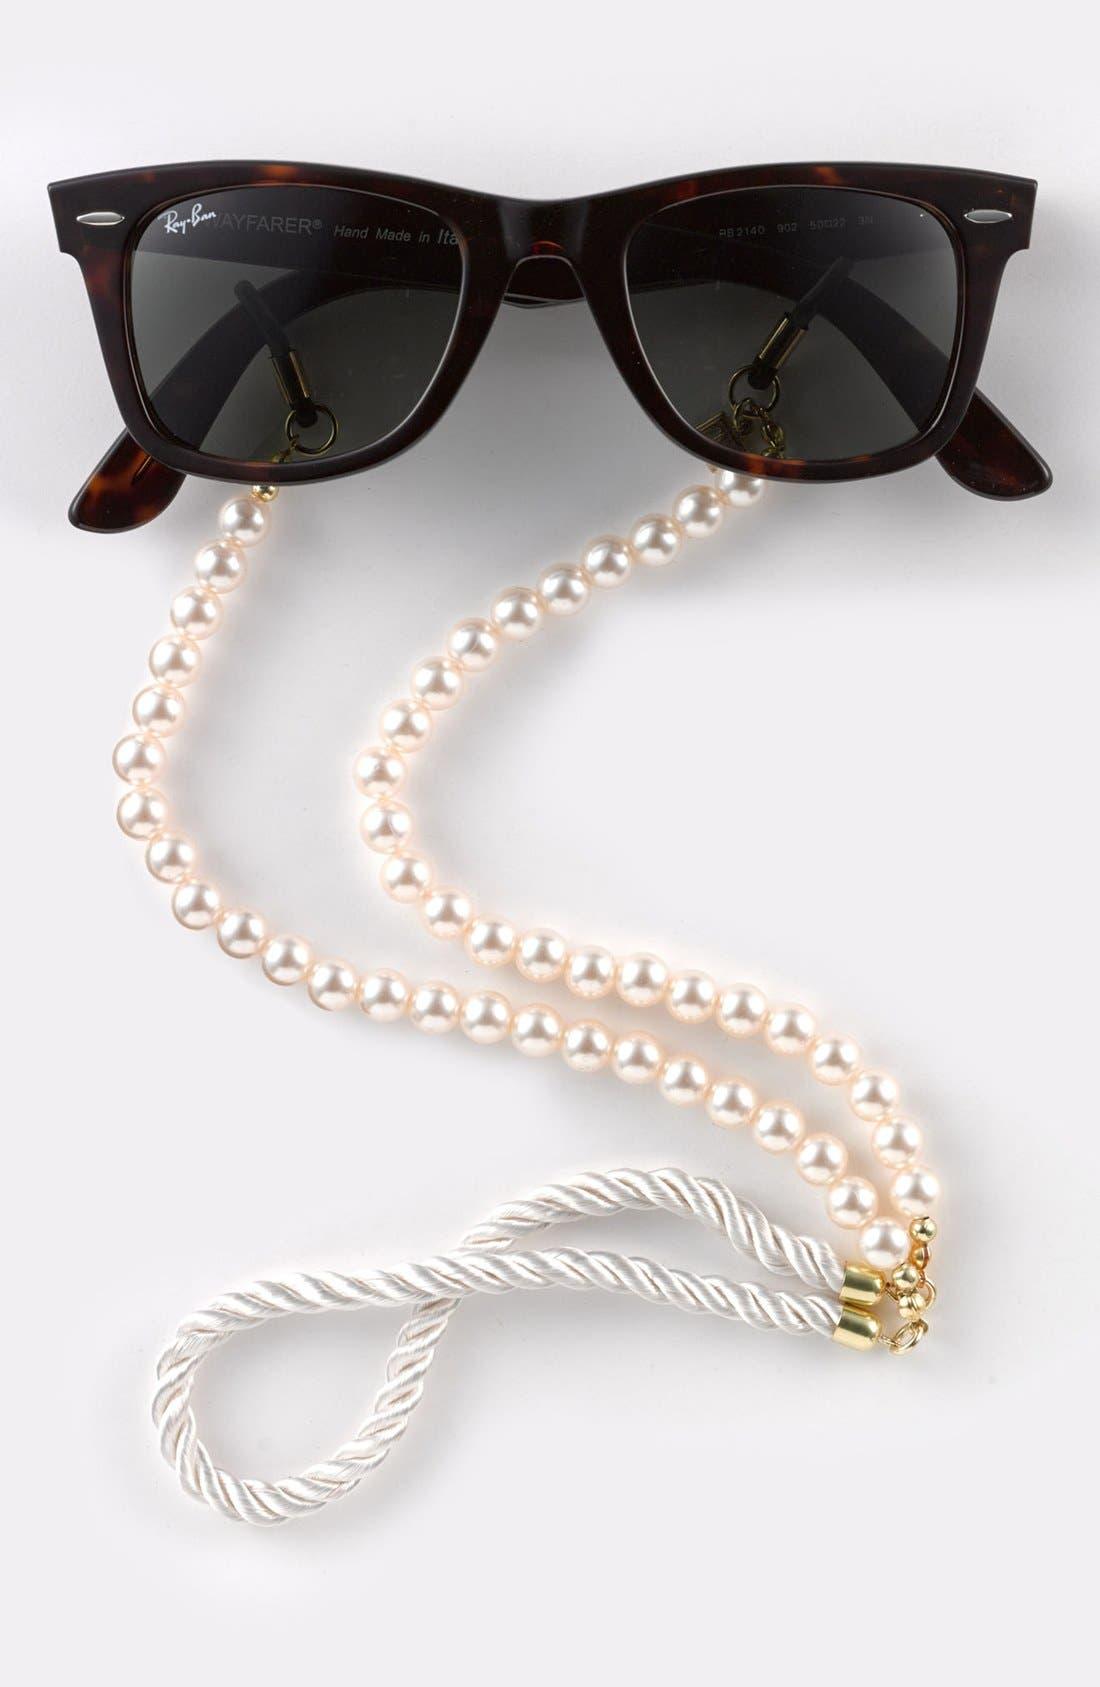 Main Image - Corinne McCormack 'Pearls' Eyewear Chain (Nordstrom Exclusive)